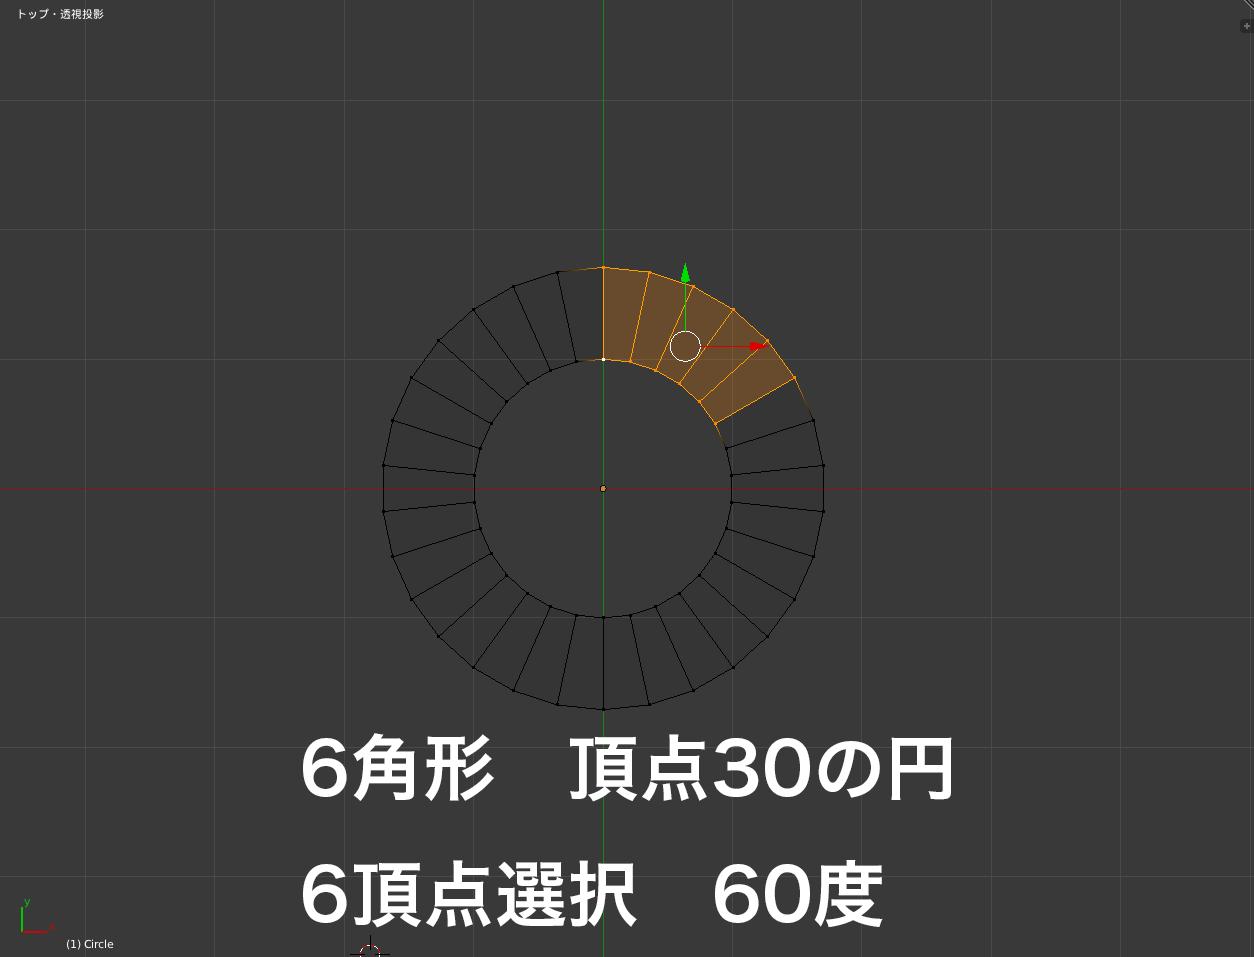 blender Circular angle value 円の角度の値